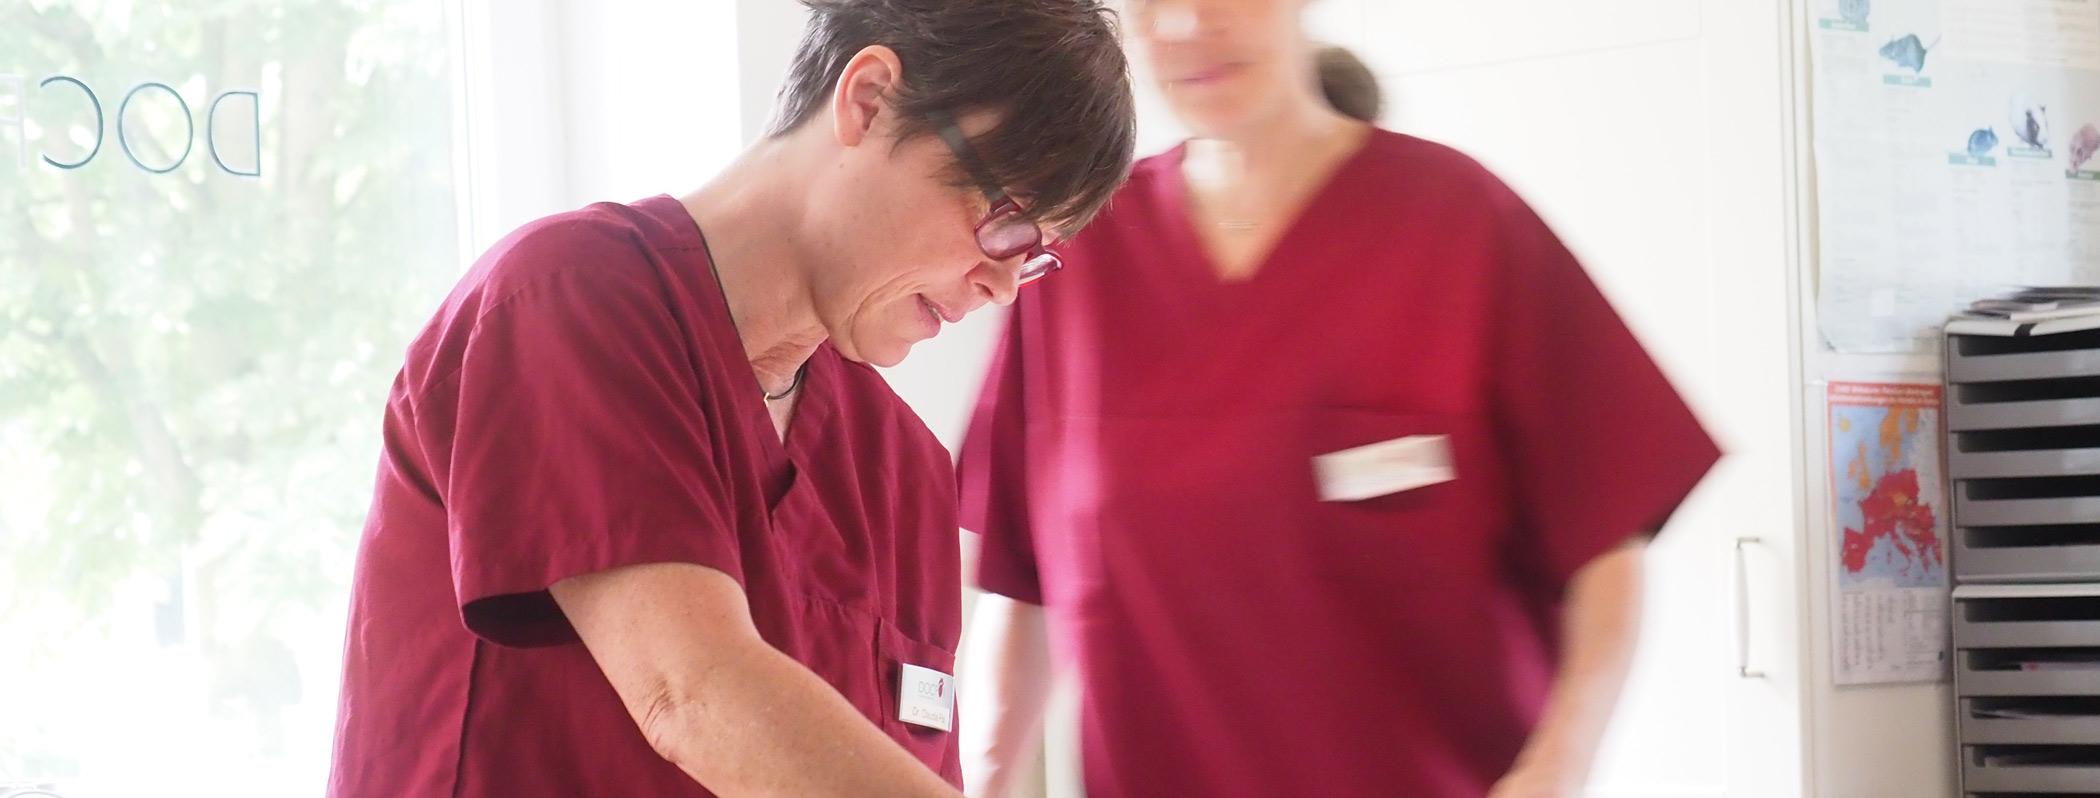 Dr.med.vet. Claudia Pox und Dr.med.vet. Eva George bei der Behandlung